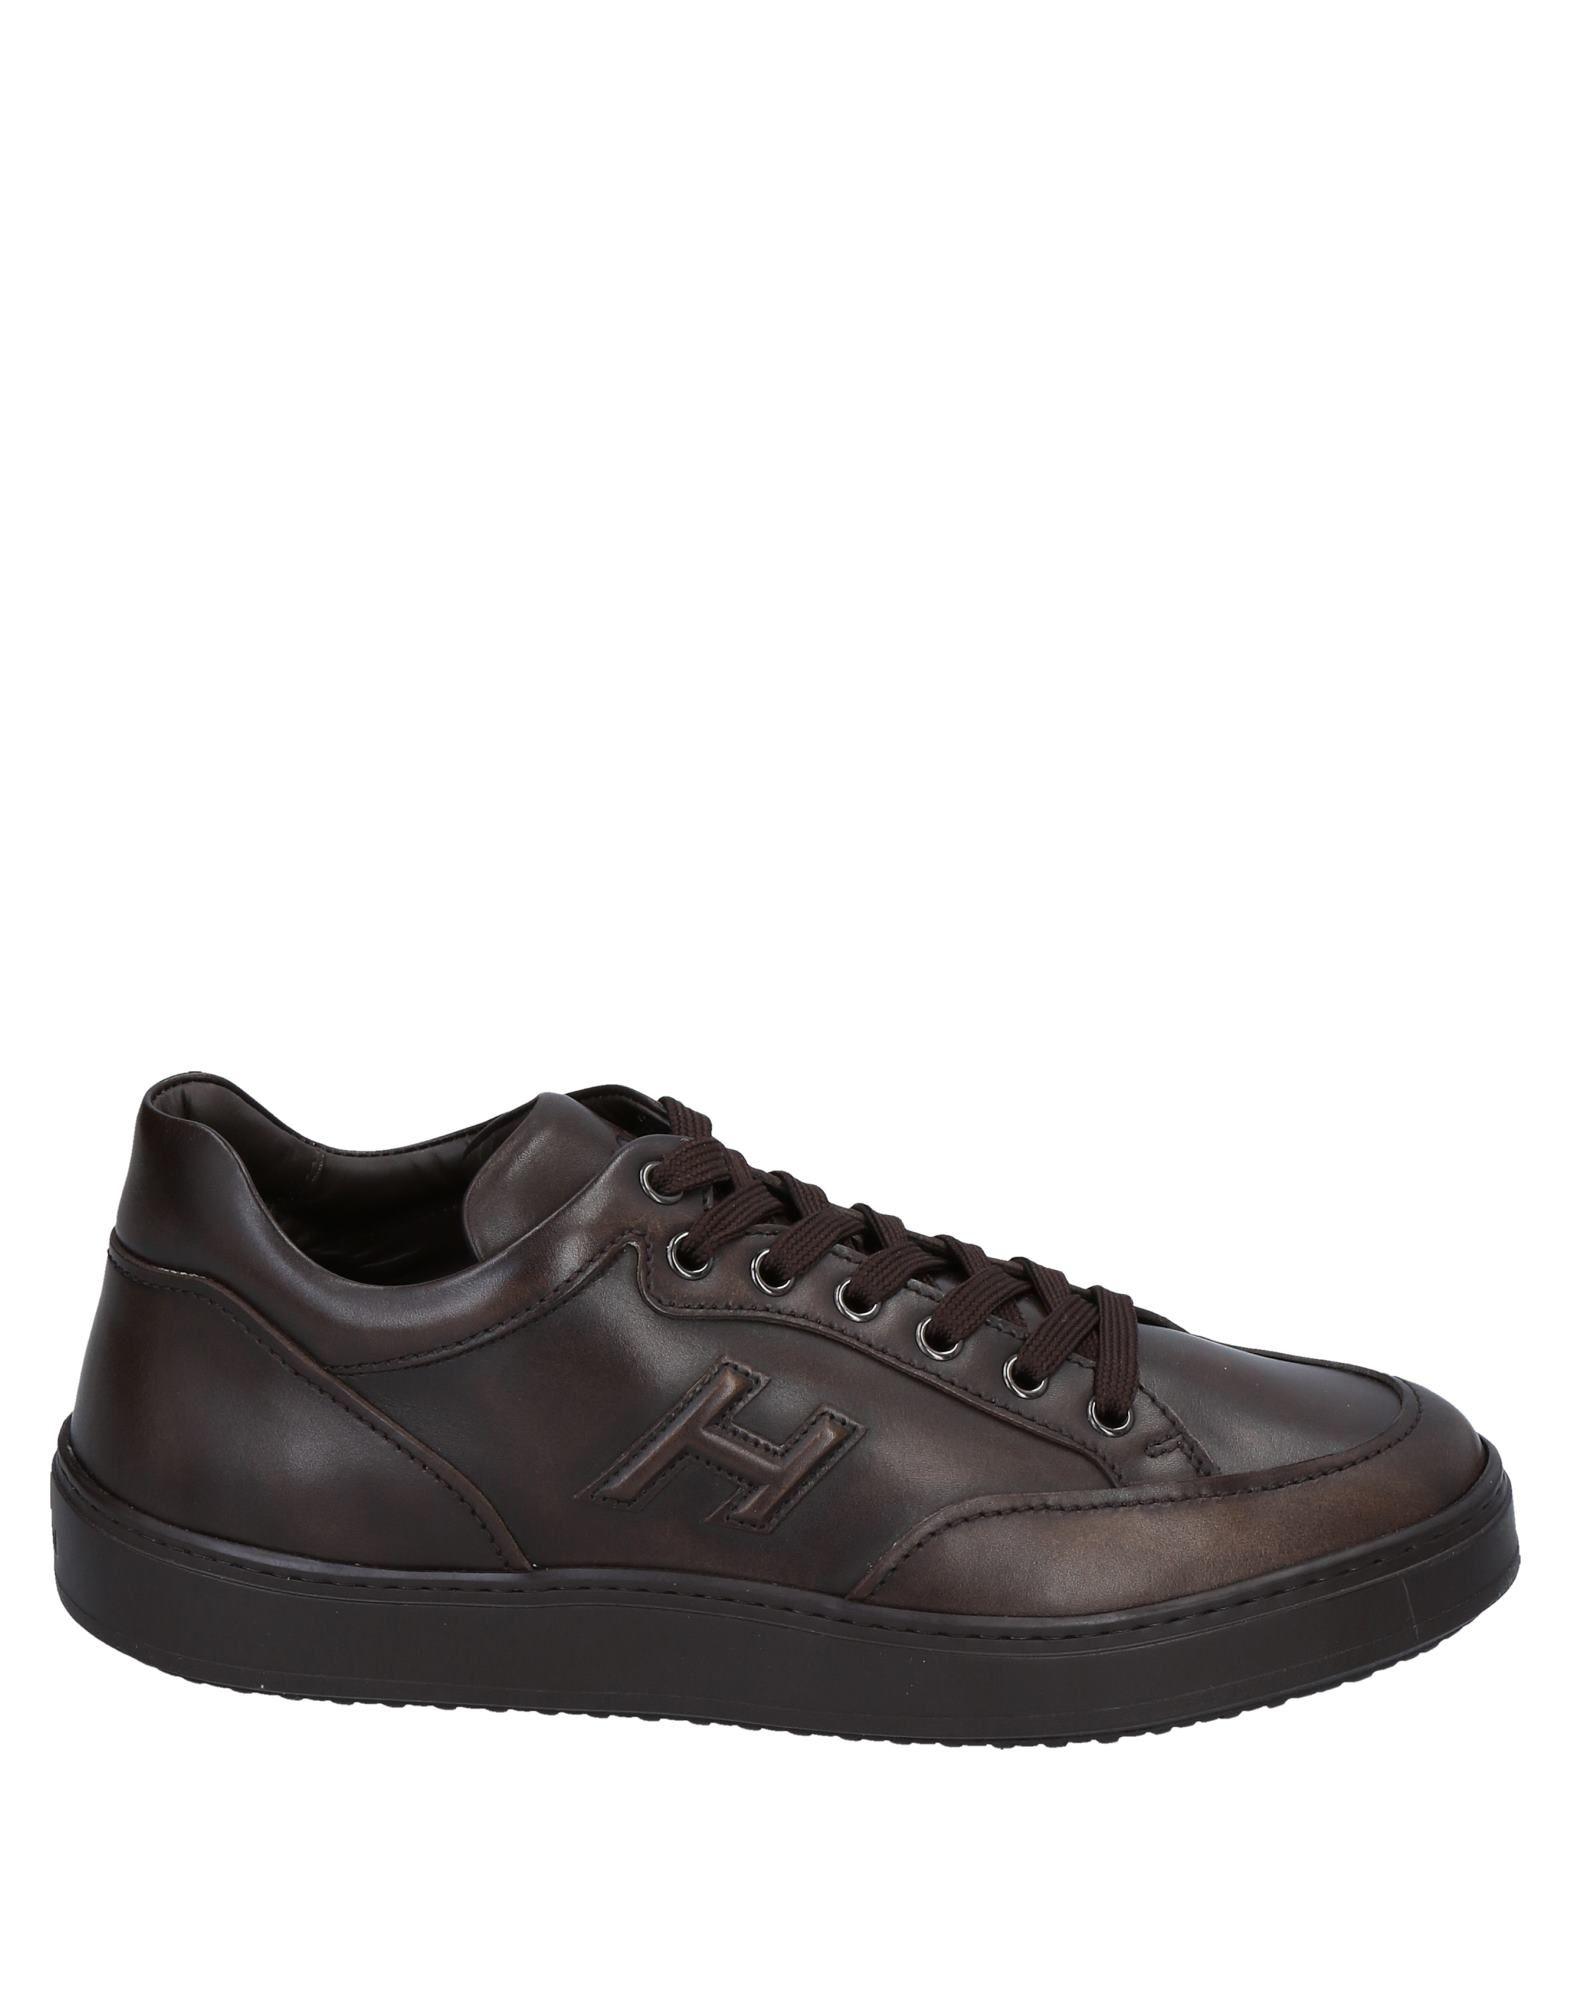 Hogan Sneakers Herren  11541089MJ Gute Qualität beliebte Schuhe